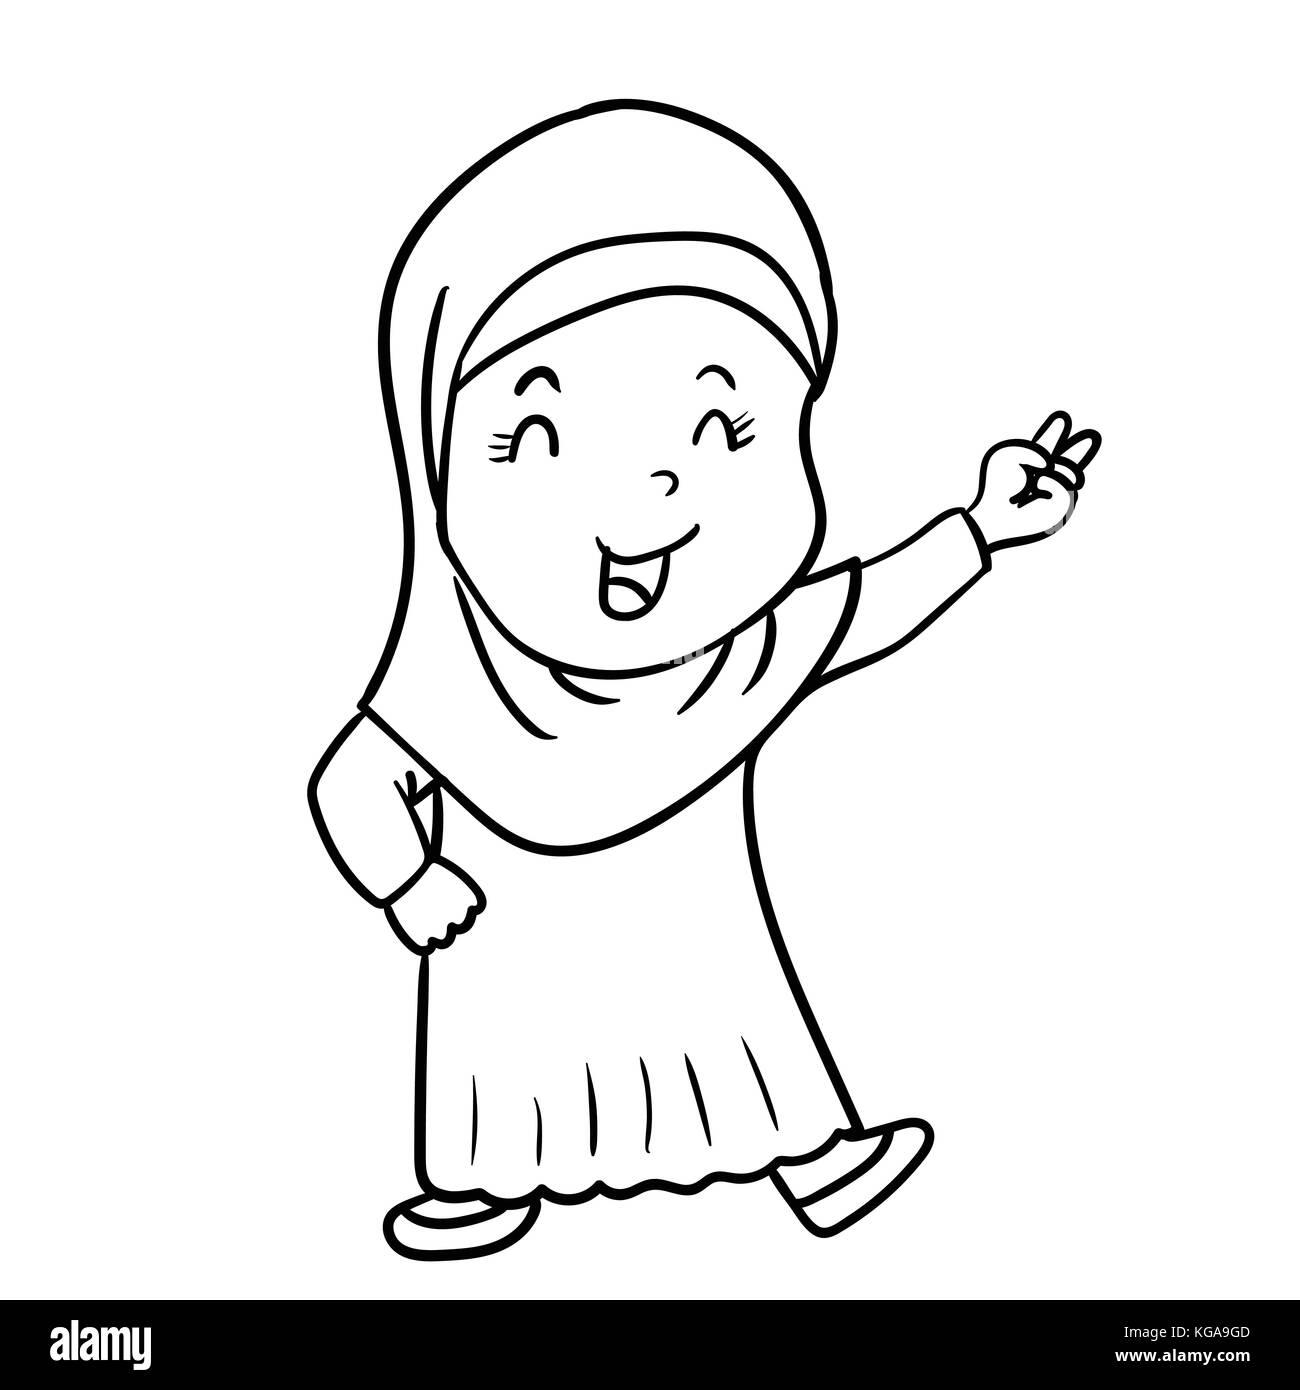 Dessin à La Main Jeune Fille Musulmane Caricature Avec La